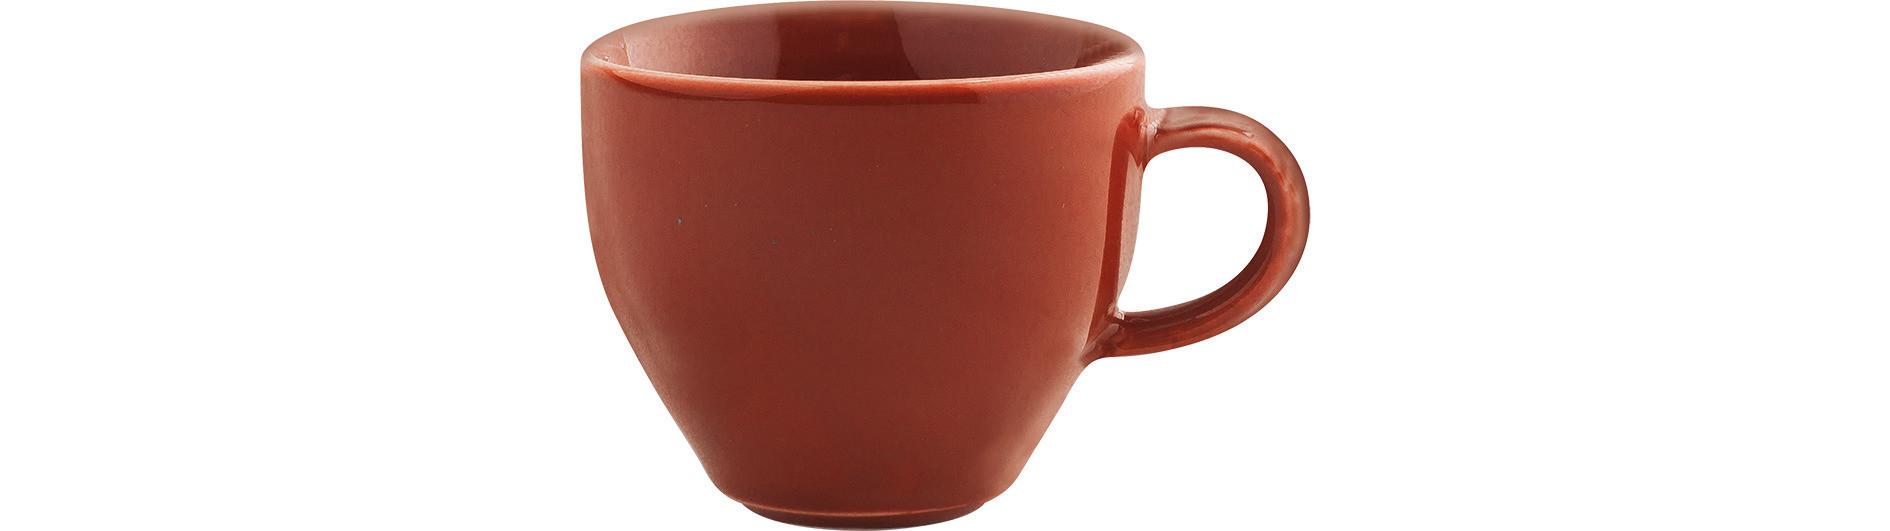 Homestyle, Milchkaffeetasse ø 101 mm / 0,30 l siena red